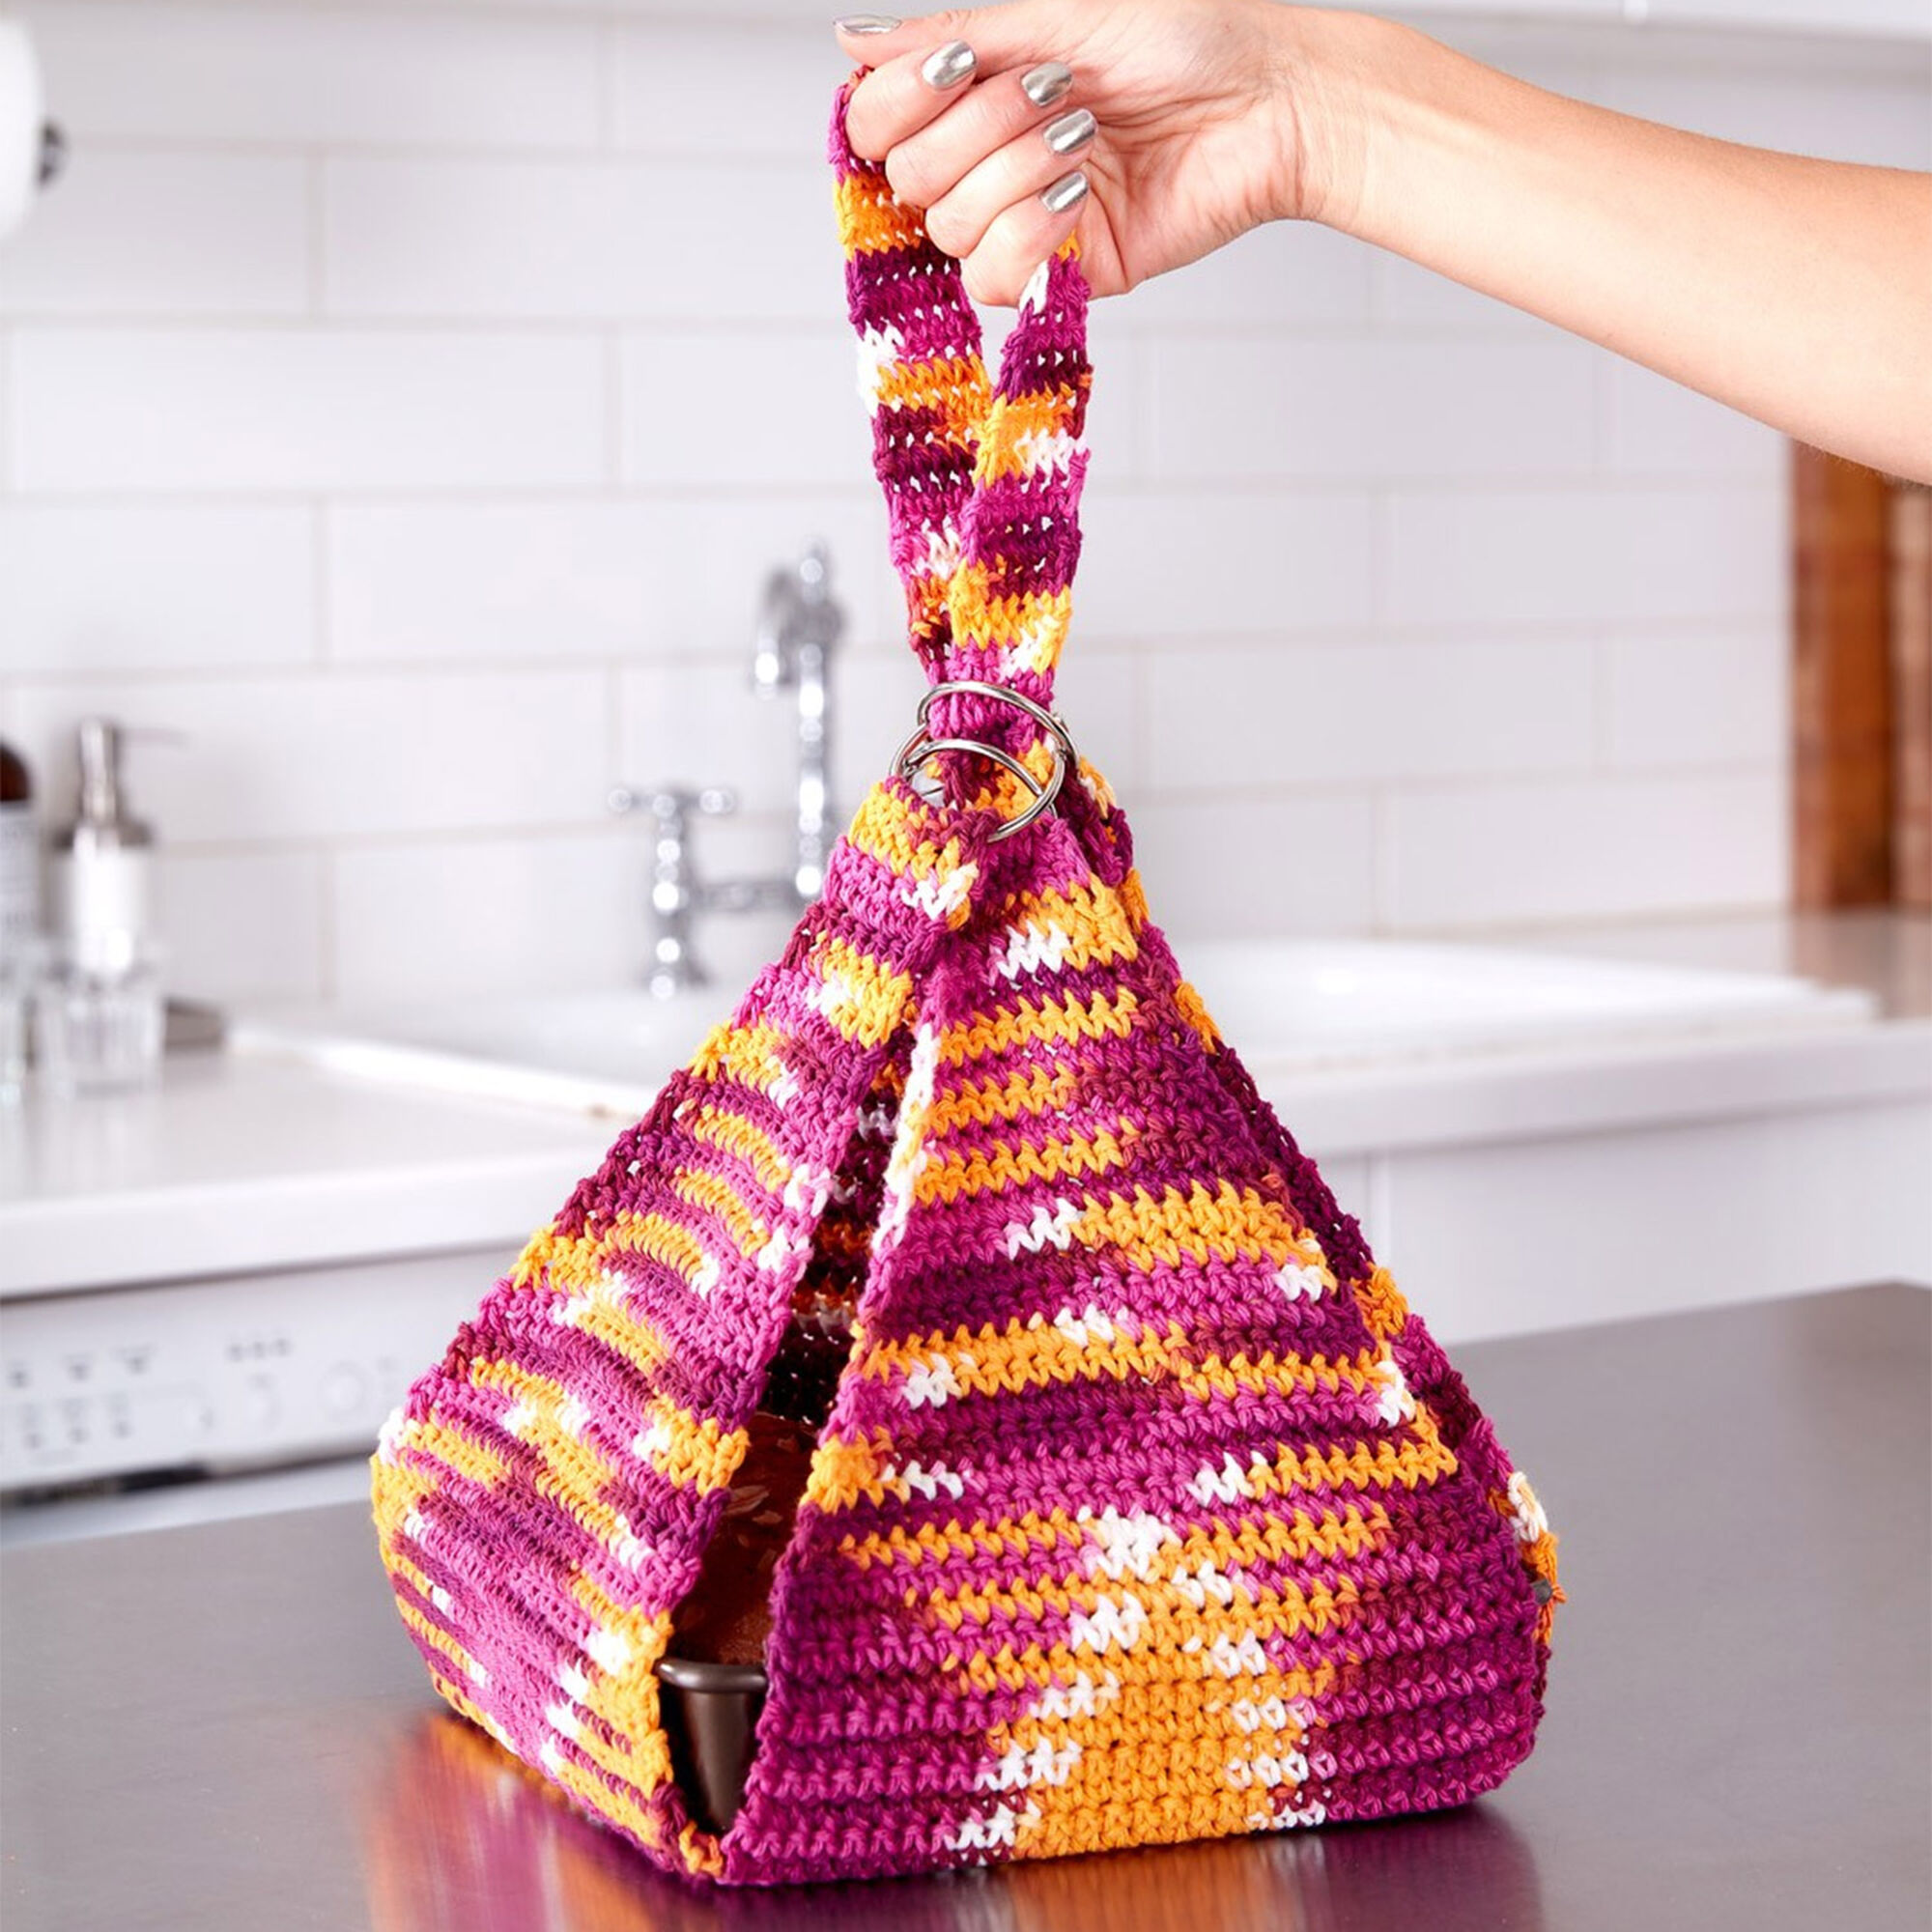 Lily Sugar'n Cream Casserole Carrier to Crochet | Yarnspirations